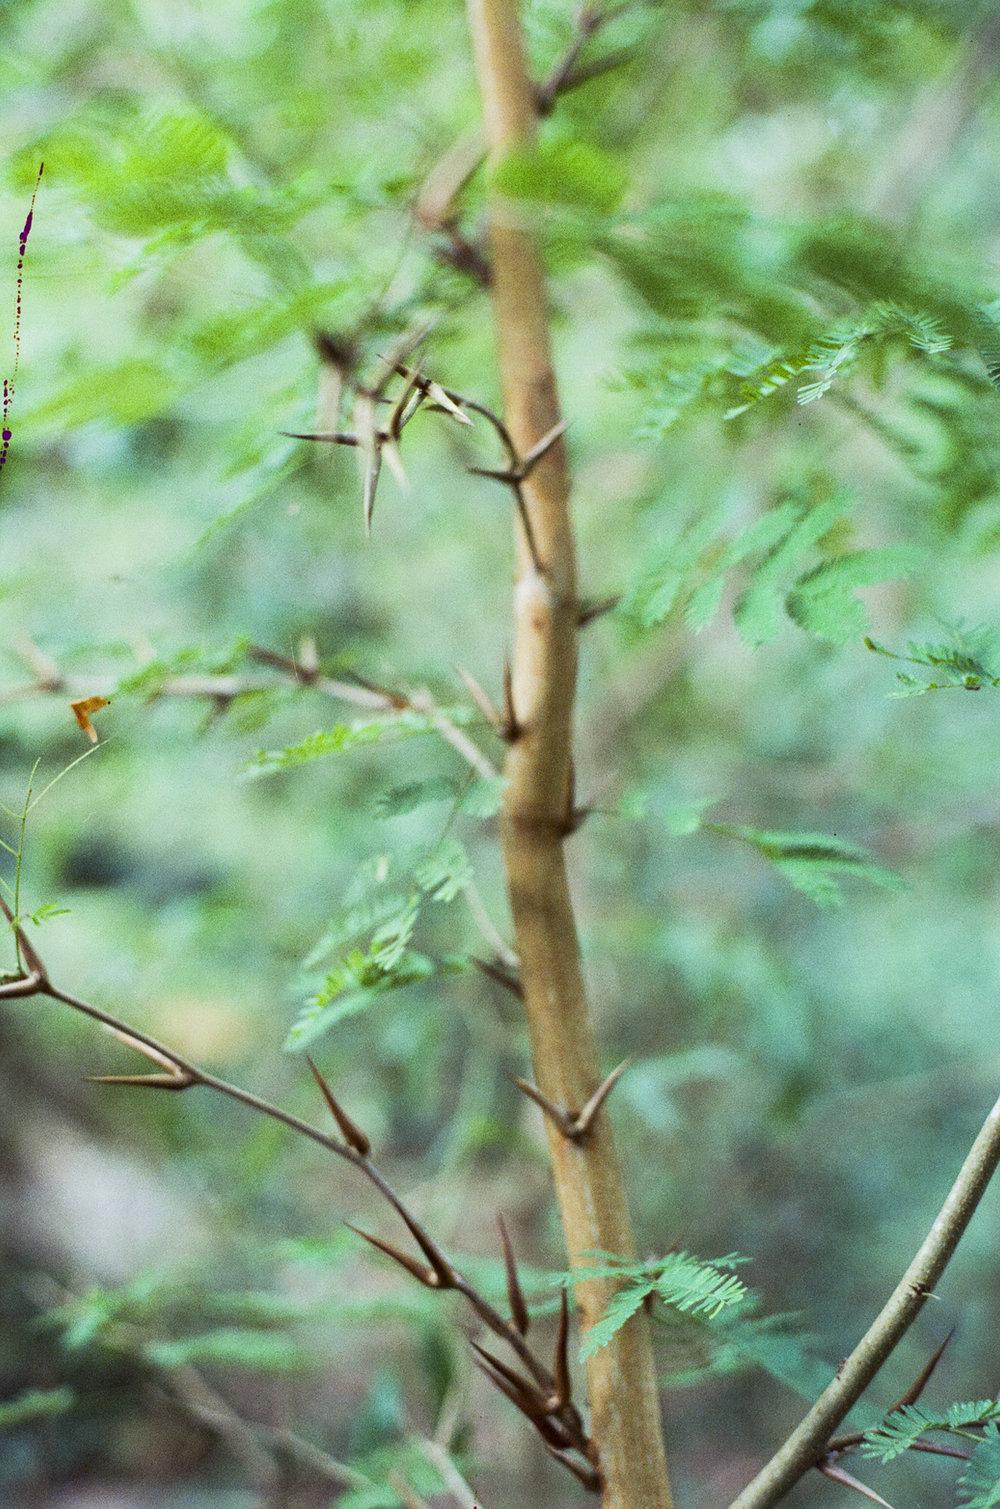 Thorns-1.jpg